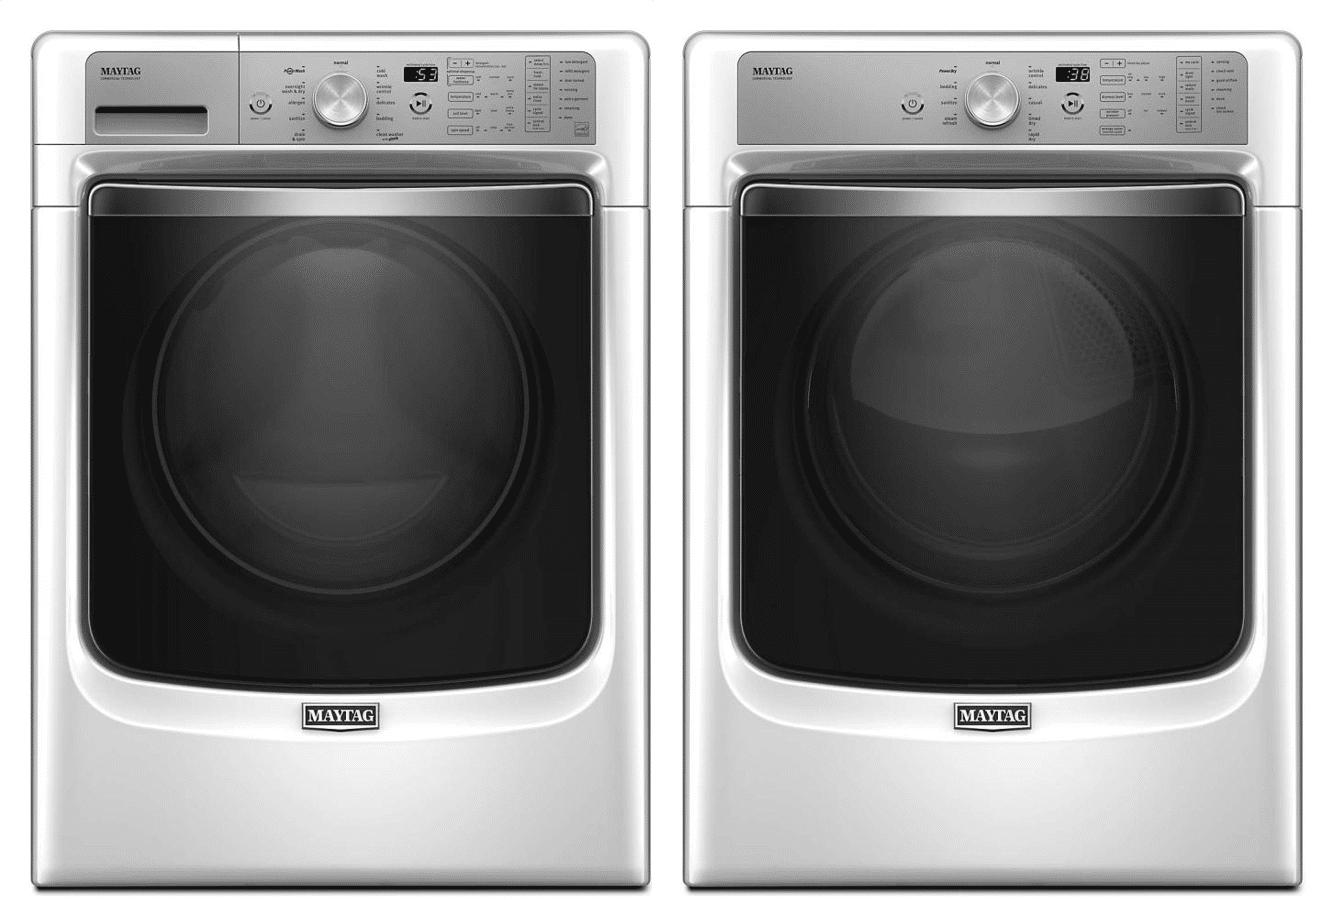 Maytag-8200-series-laundry-set.png